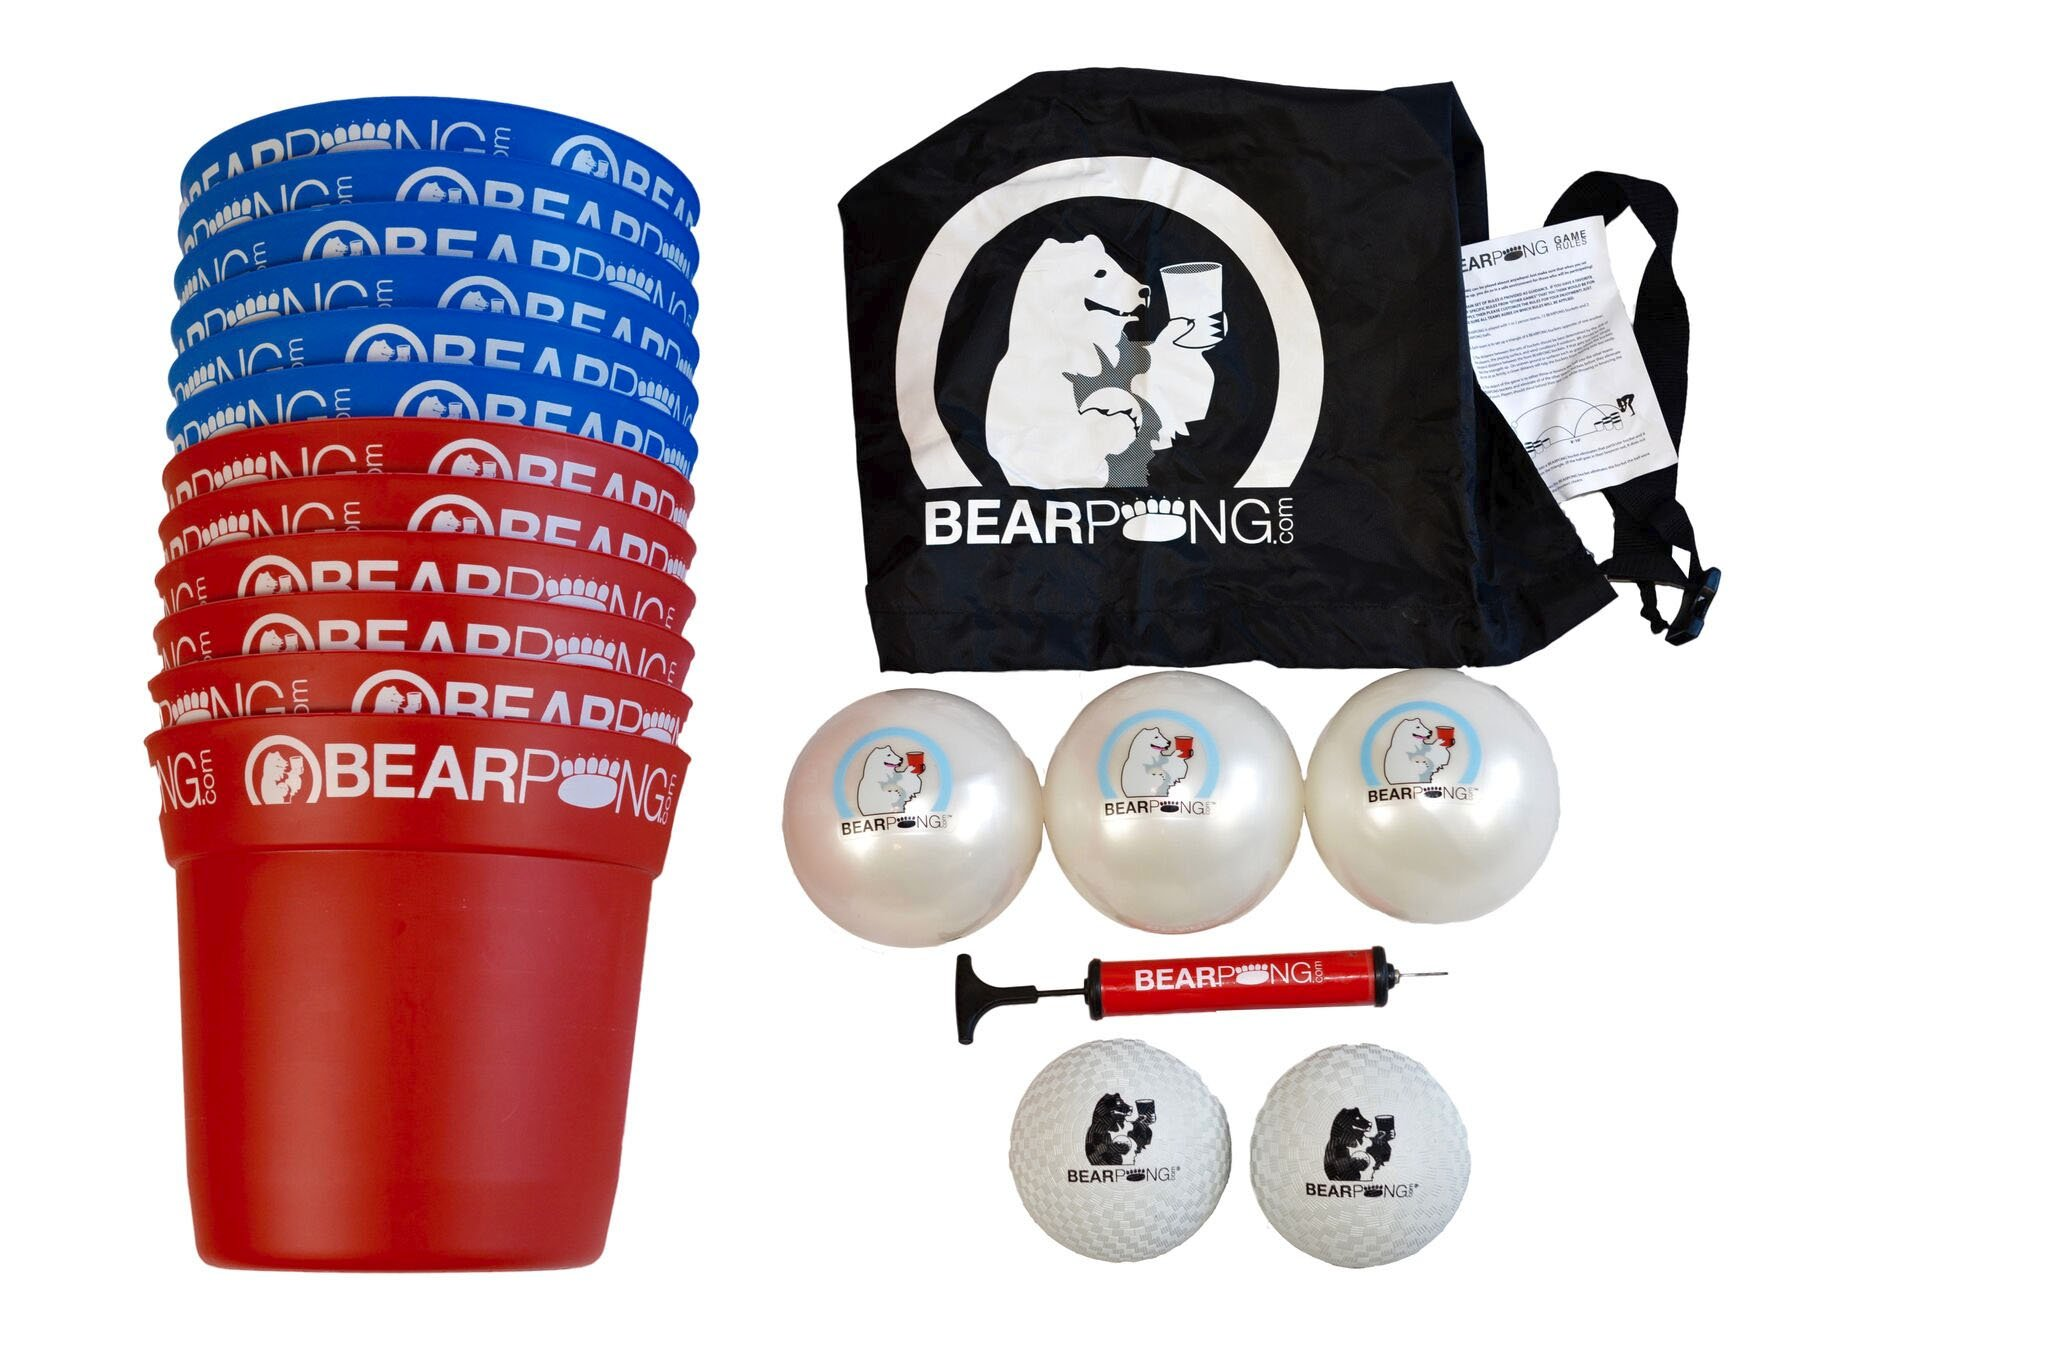 Bearpong Deluxe Game Set: 12 BEARPONG Buckets, 3 BEARPONG Balls, 2 Beach Balls, 1 Ball Pump with Carrying Case, and Instructions (Red/Blue) by Bear Pong